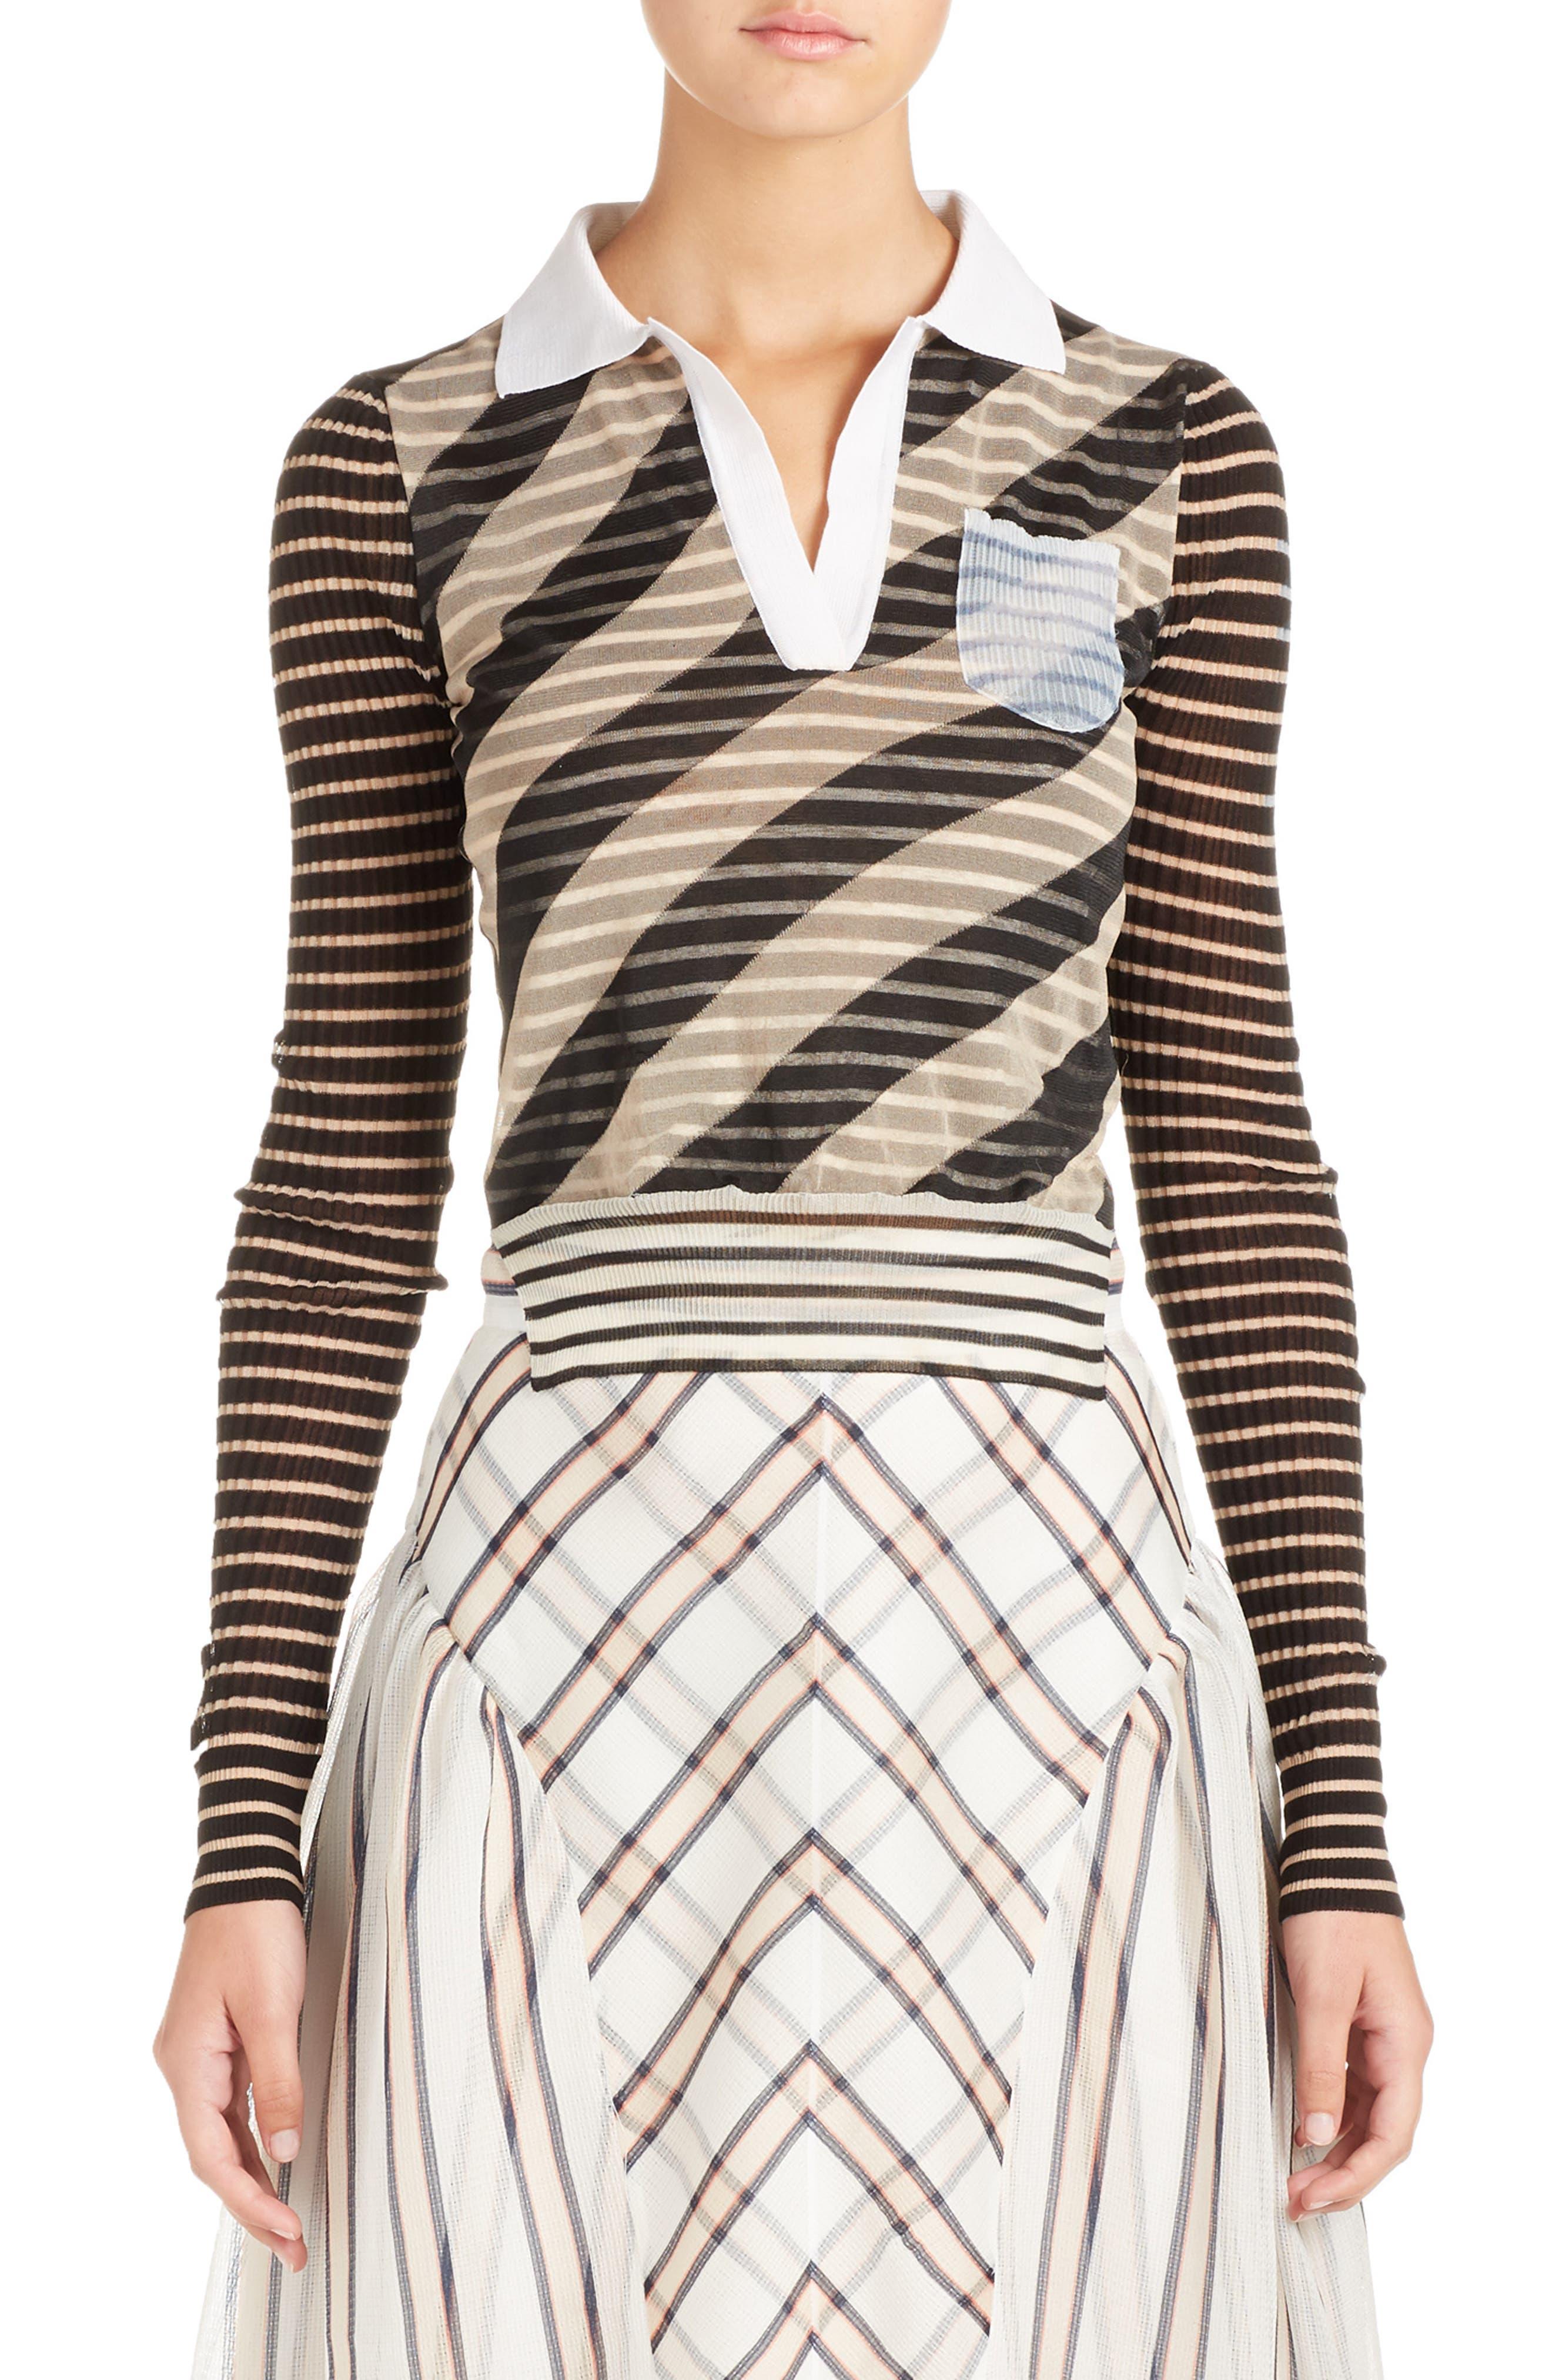 Fendi Mixed Stripe Top